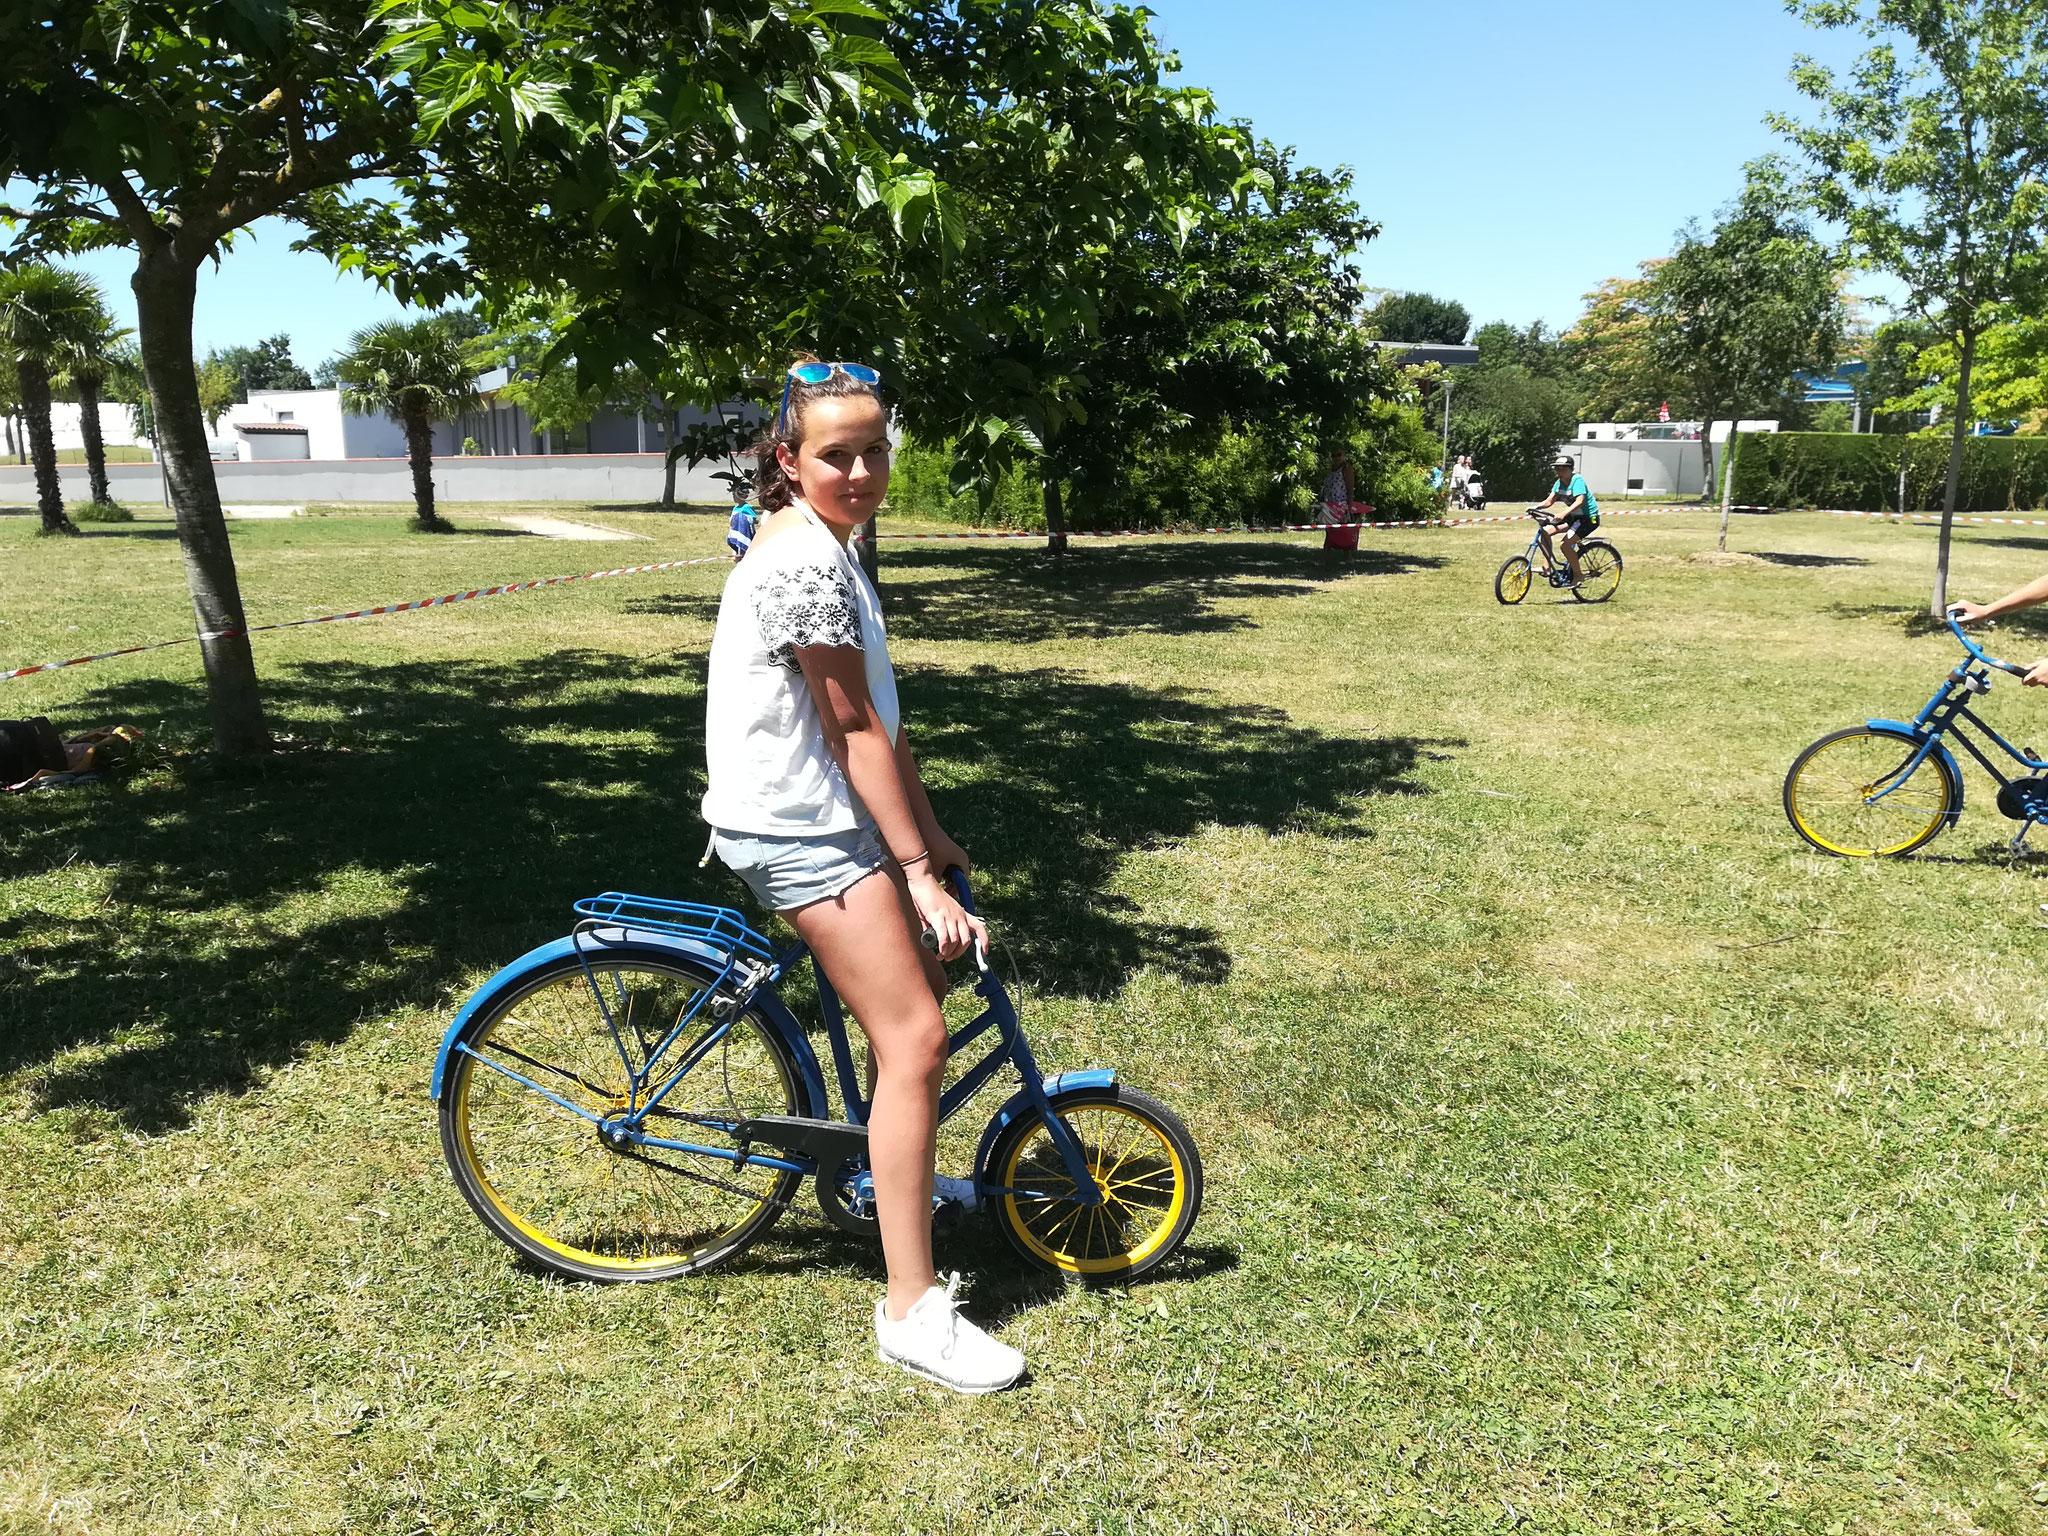 vélo rigolo - mini camp plaine tonique